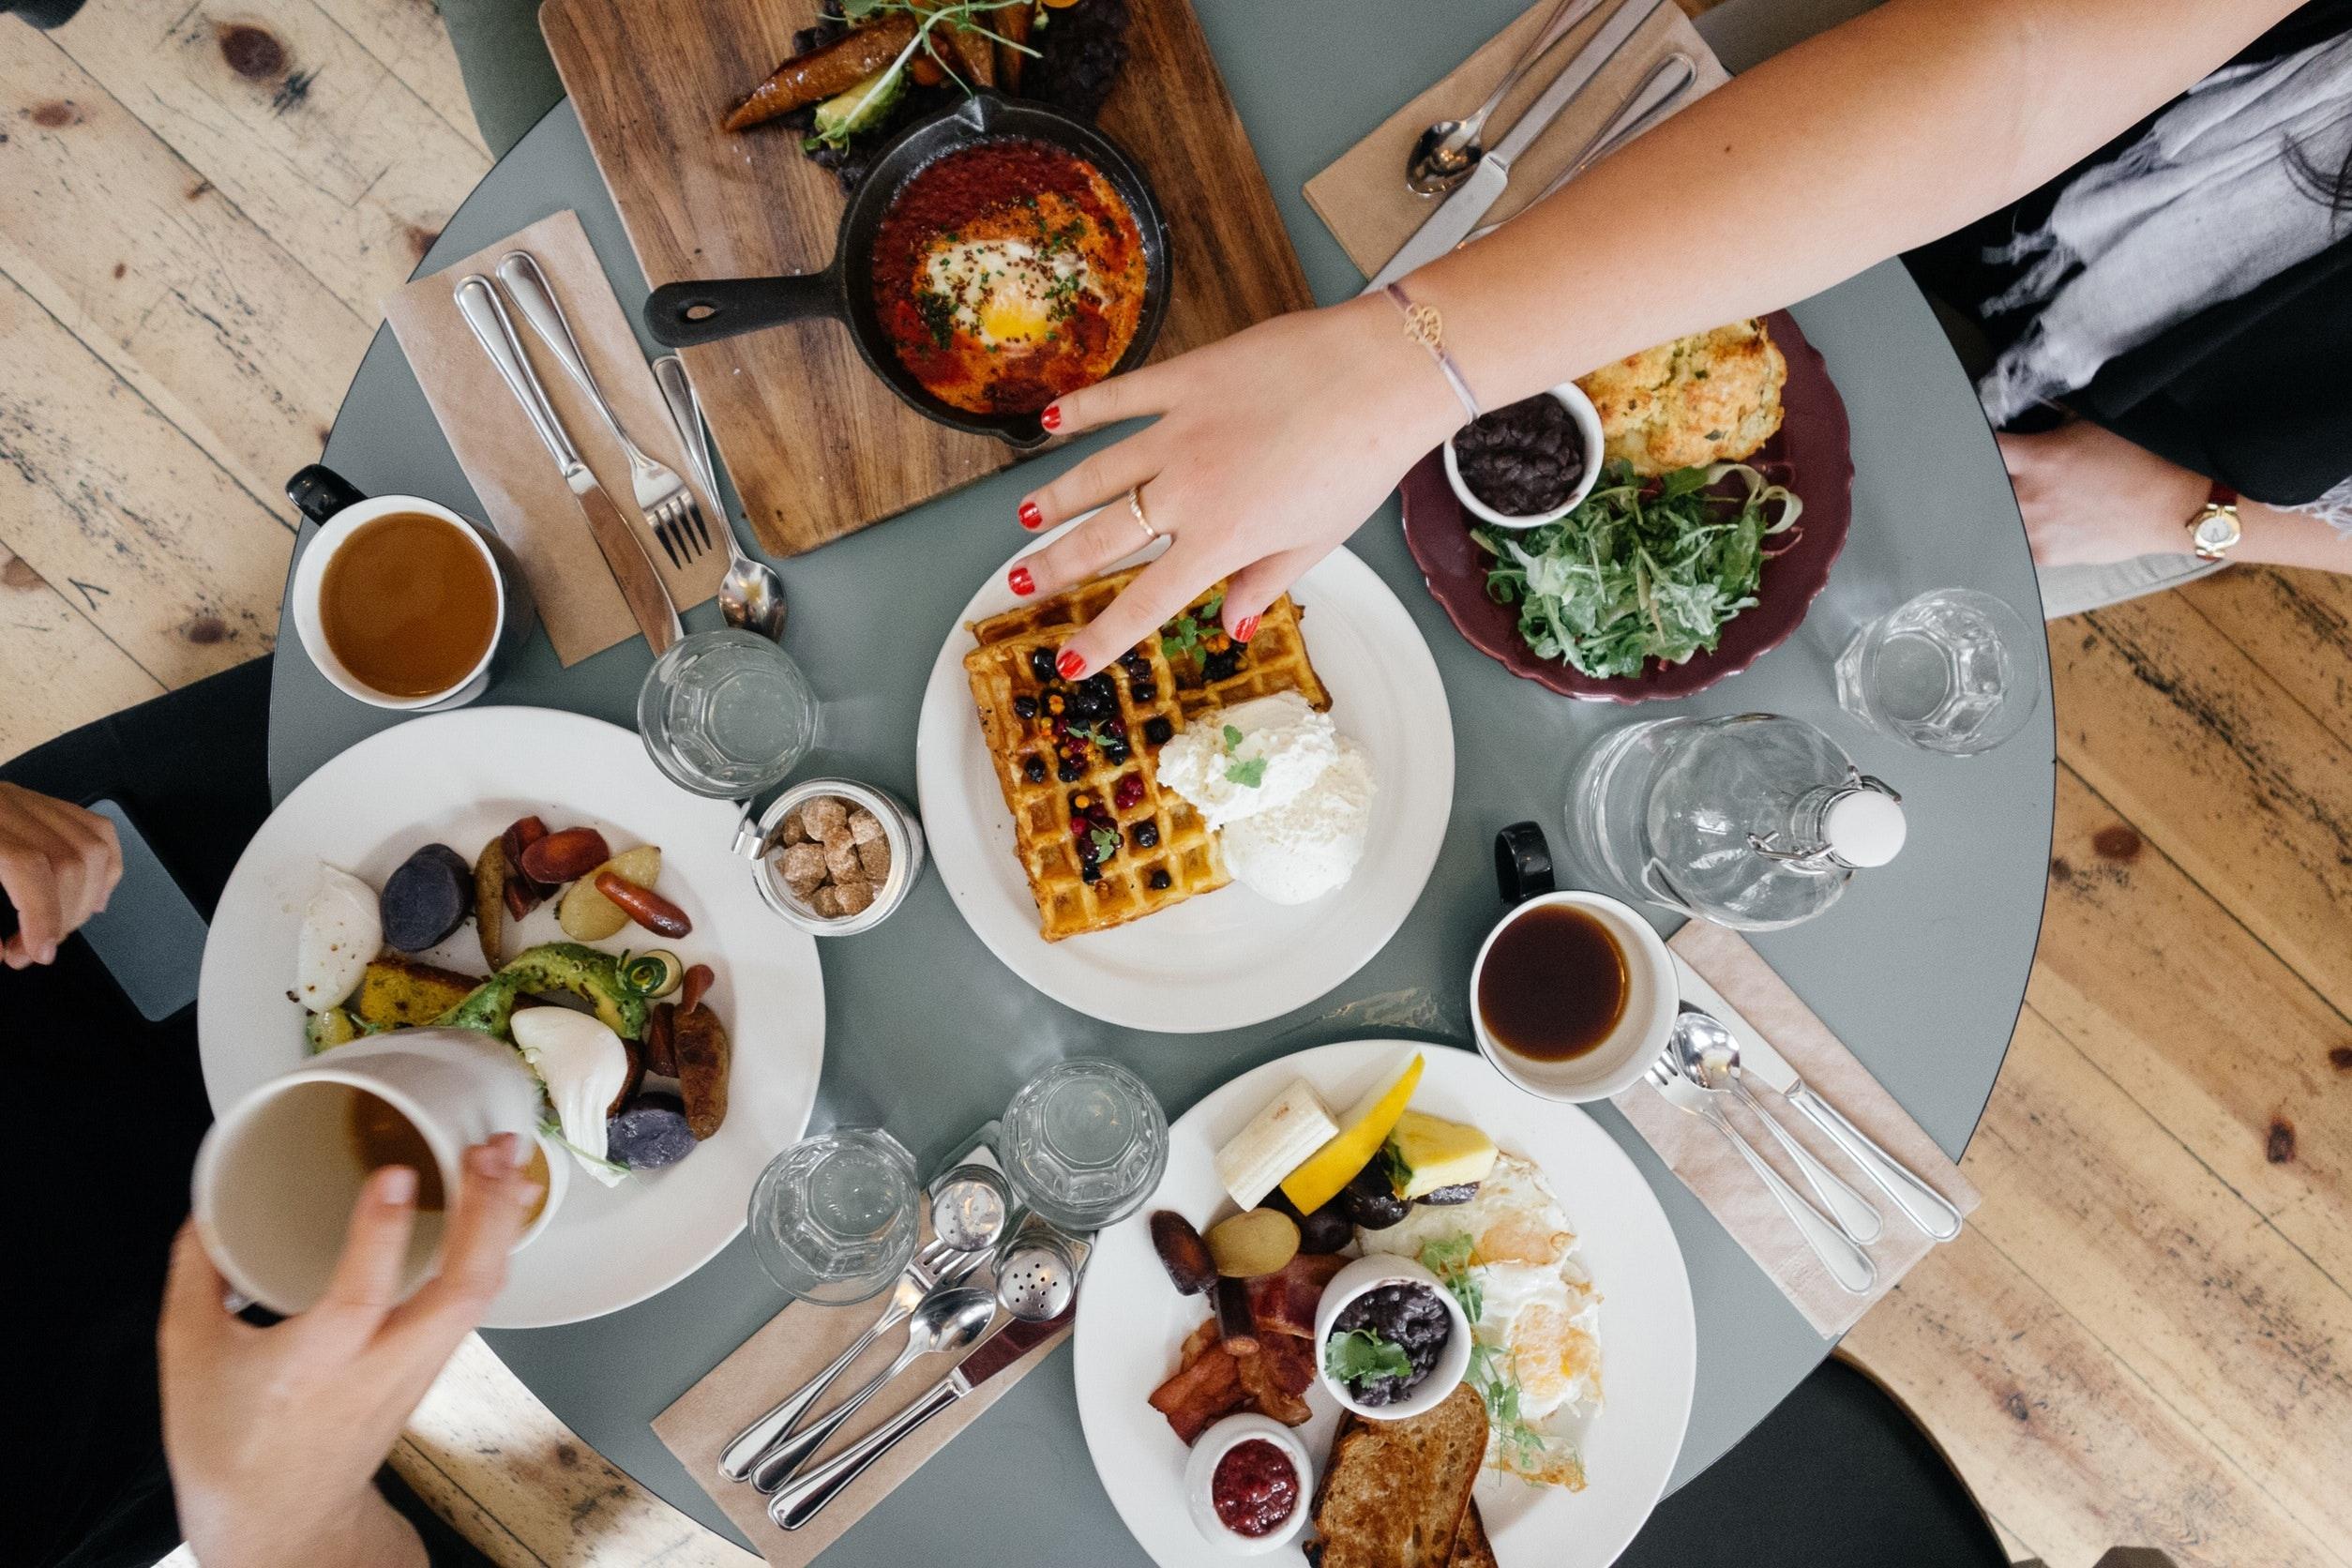 brunch, food, food trends, acai, avocados, tumeric, kombucha, matcha, oral health